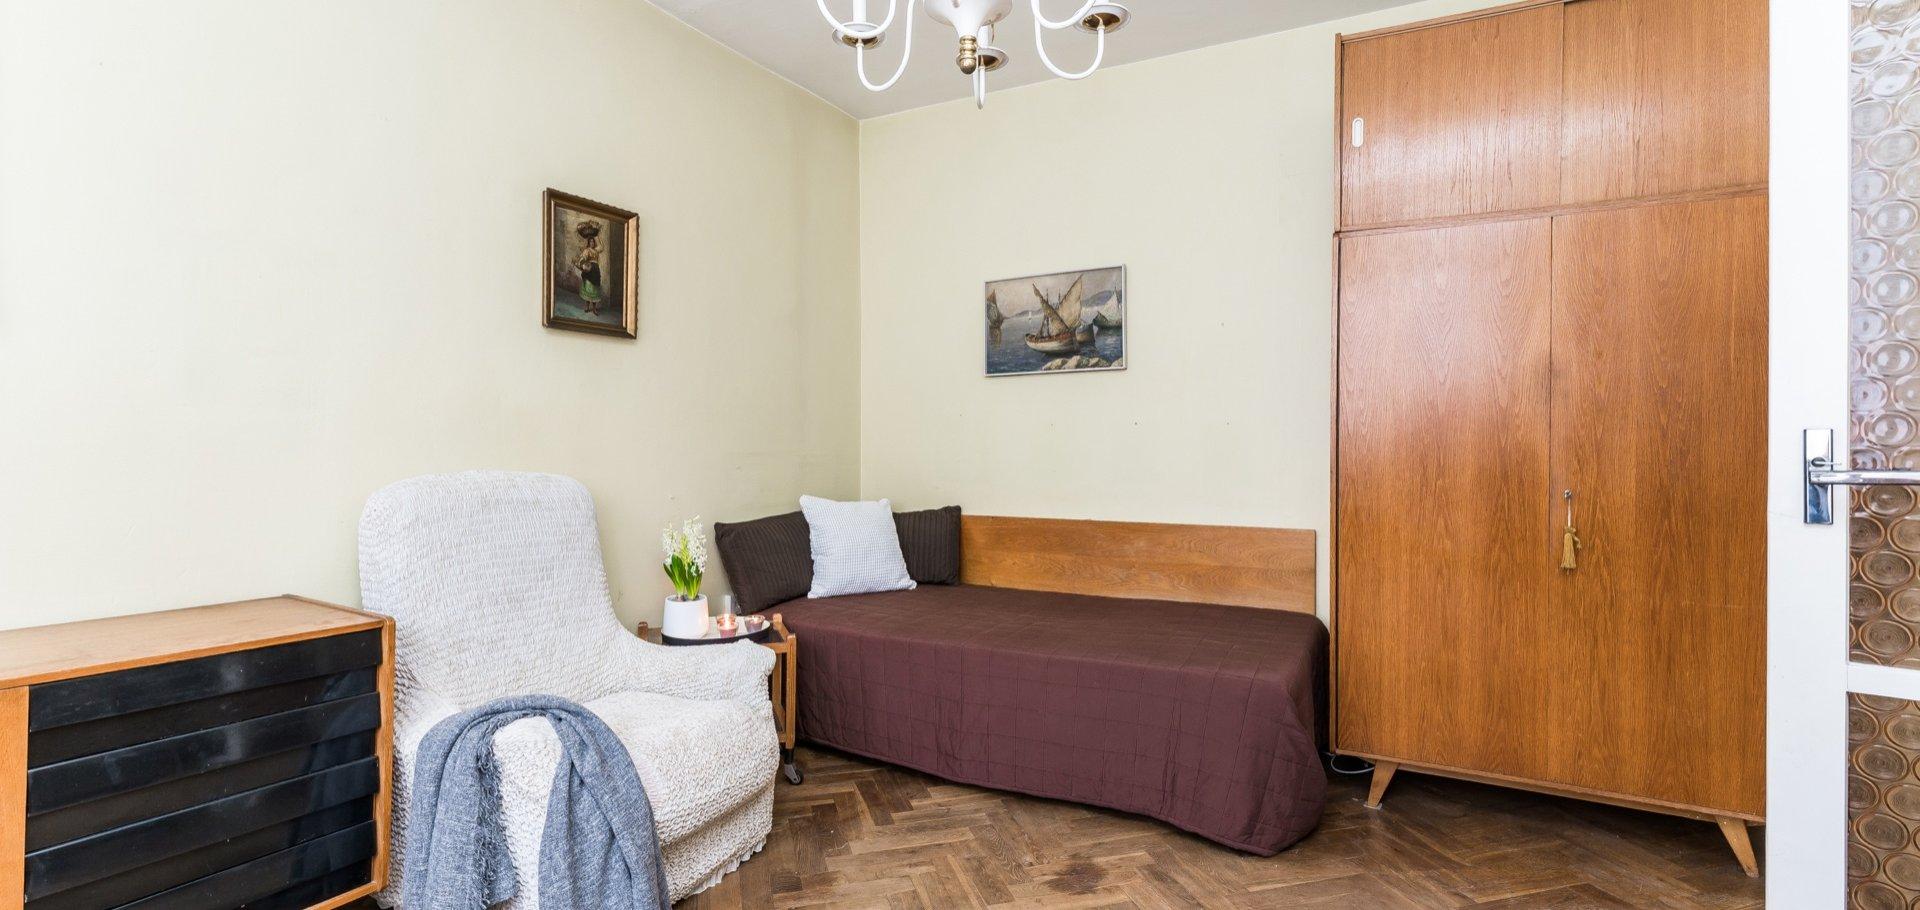 Prodej, Byty 2+1, 53m² - Praha - Záběhlice